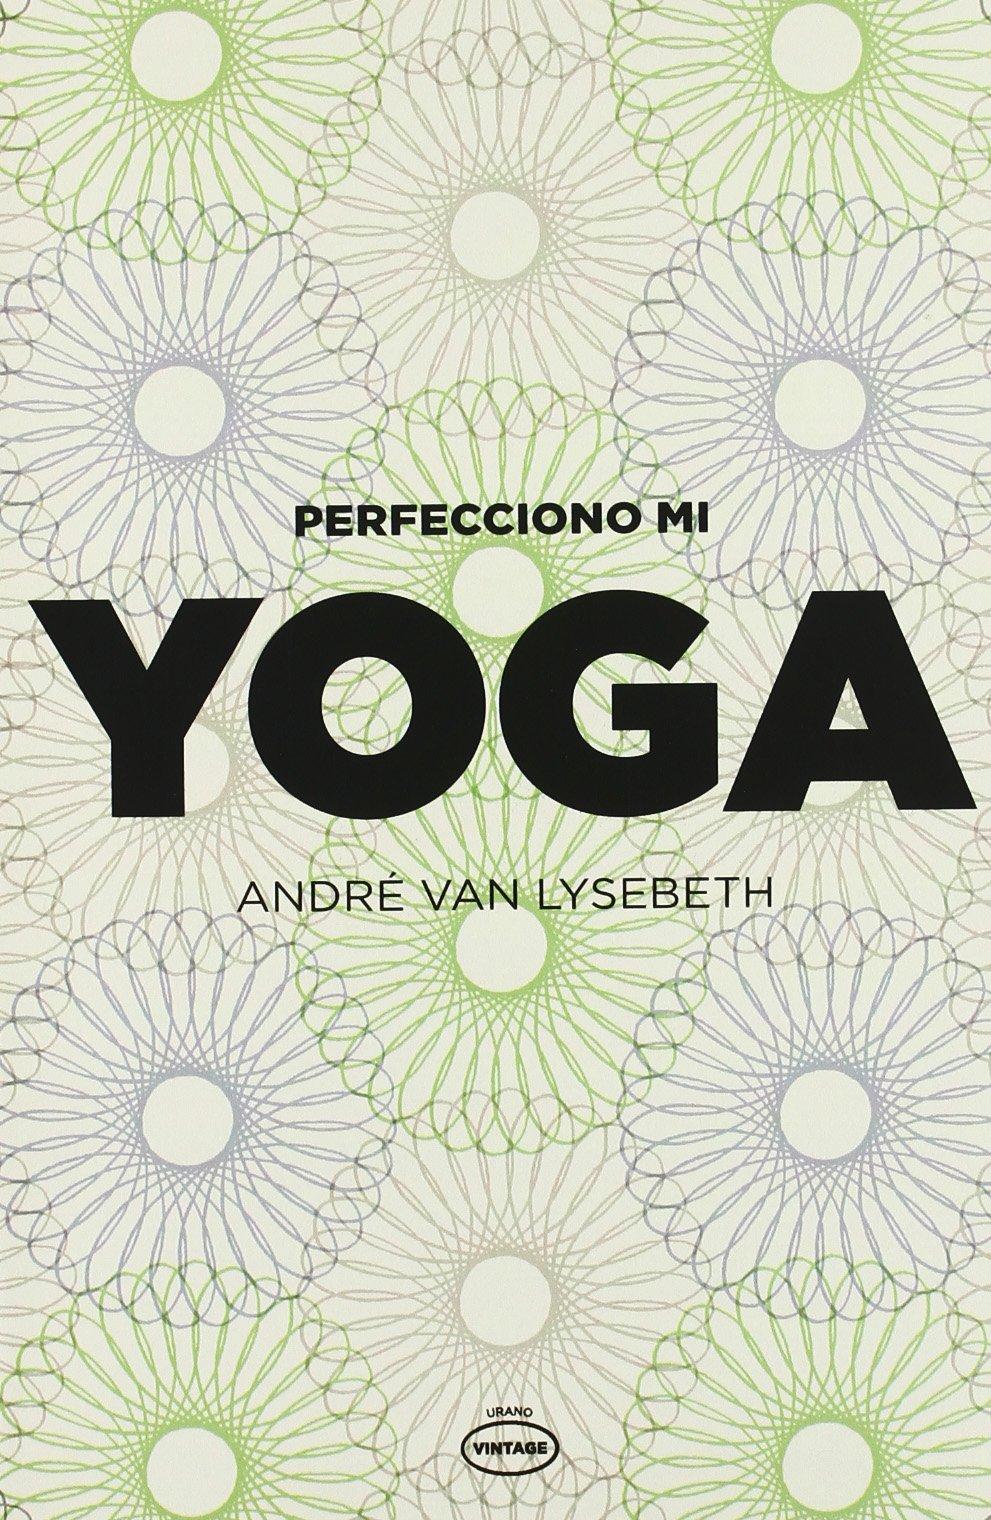 Perfecciono mi yoga (Spanish Edition): Angré Van Lysebeth ...